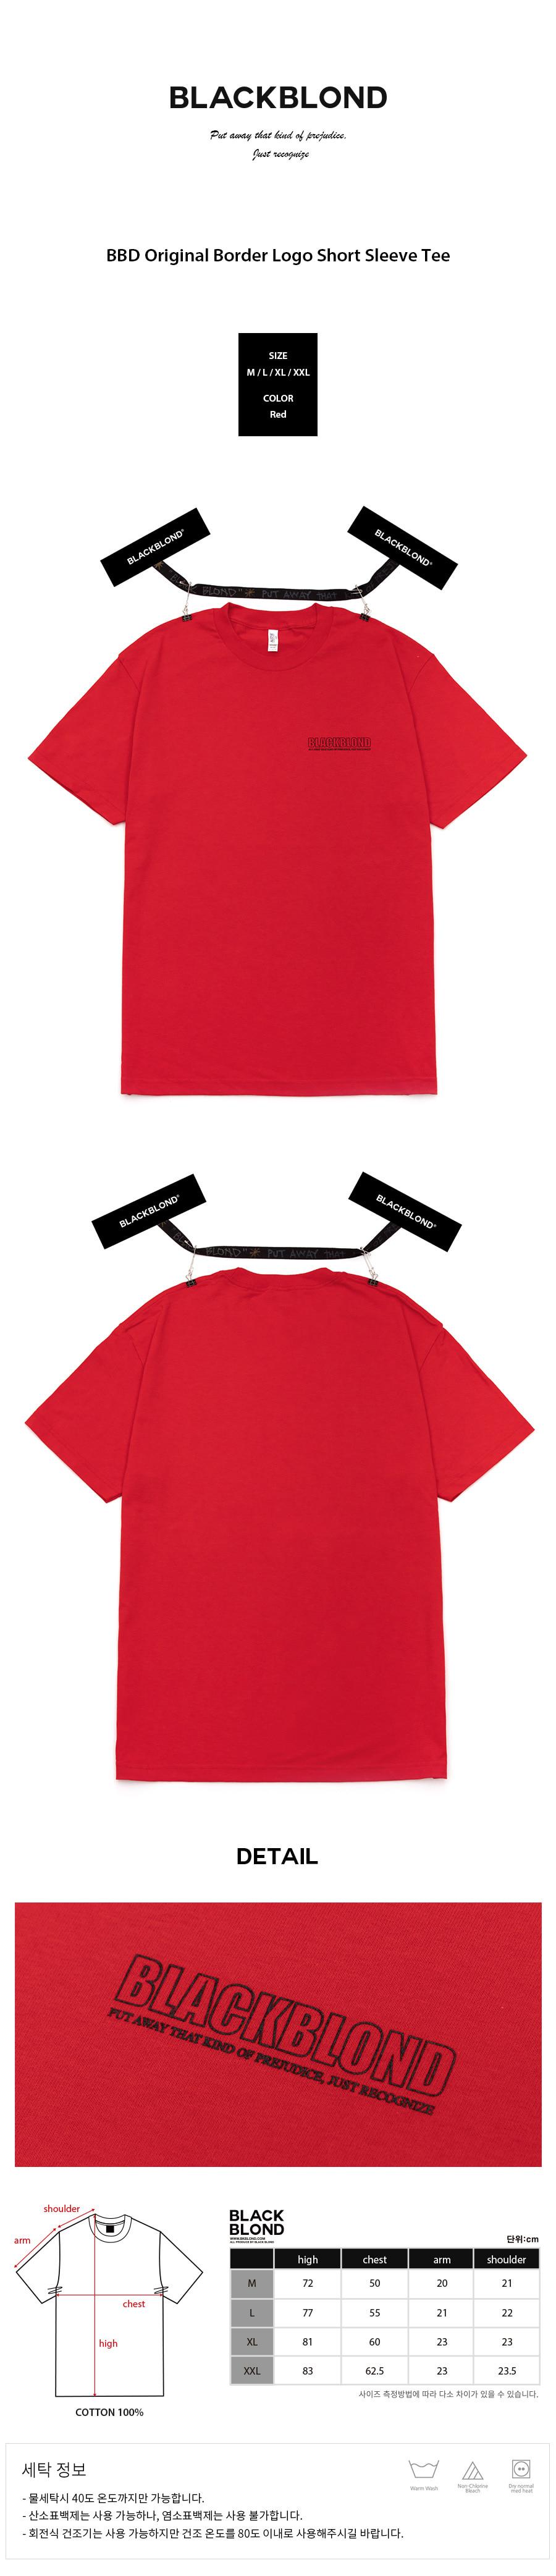 BLACKBLOND - BBD Original Border Logo Short Sleeve Tee (Red)